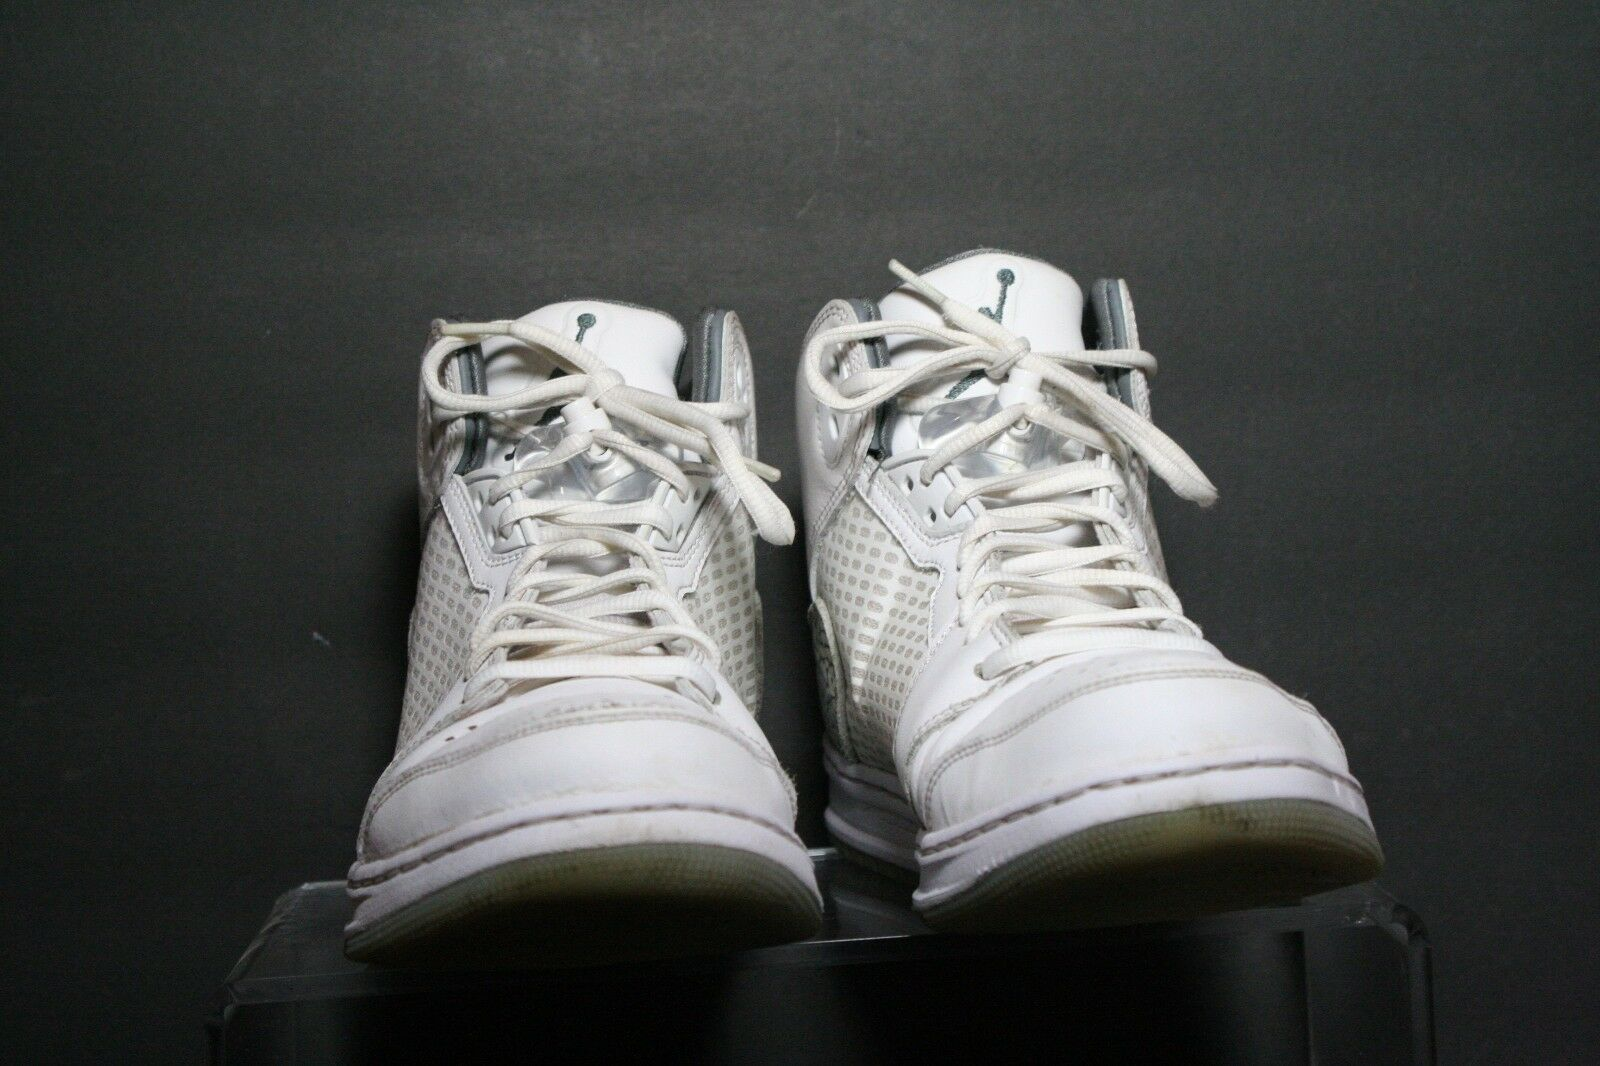 Nike air jordan il primo 5 scarpa